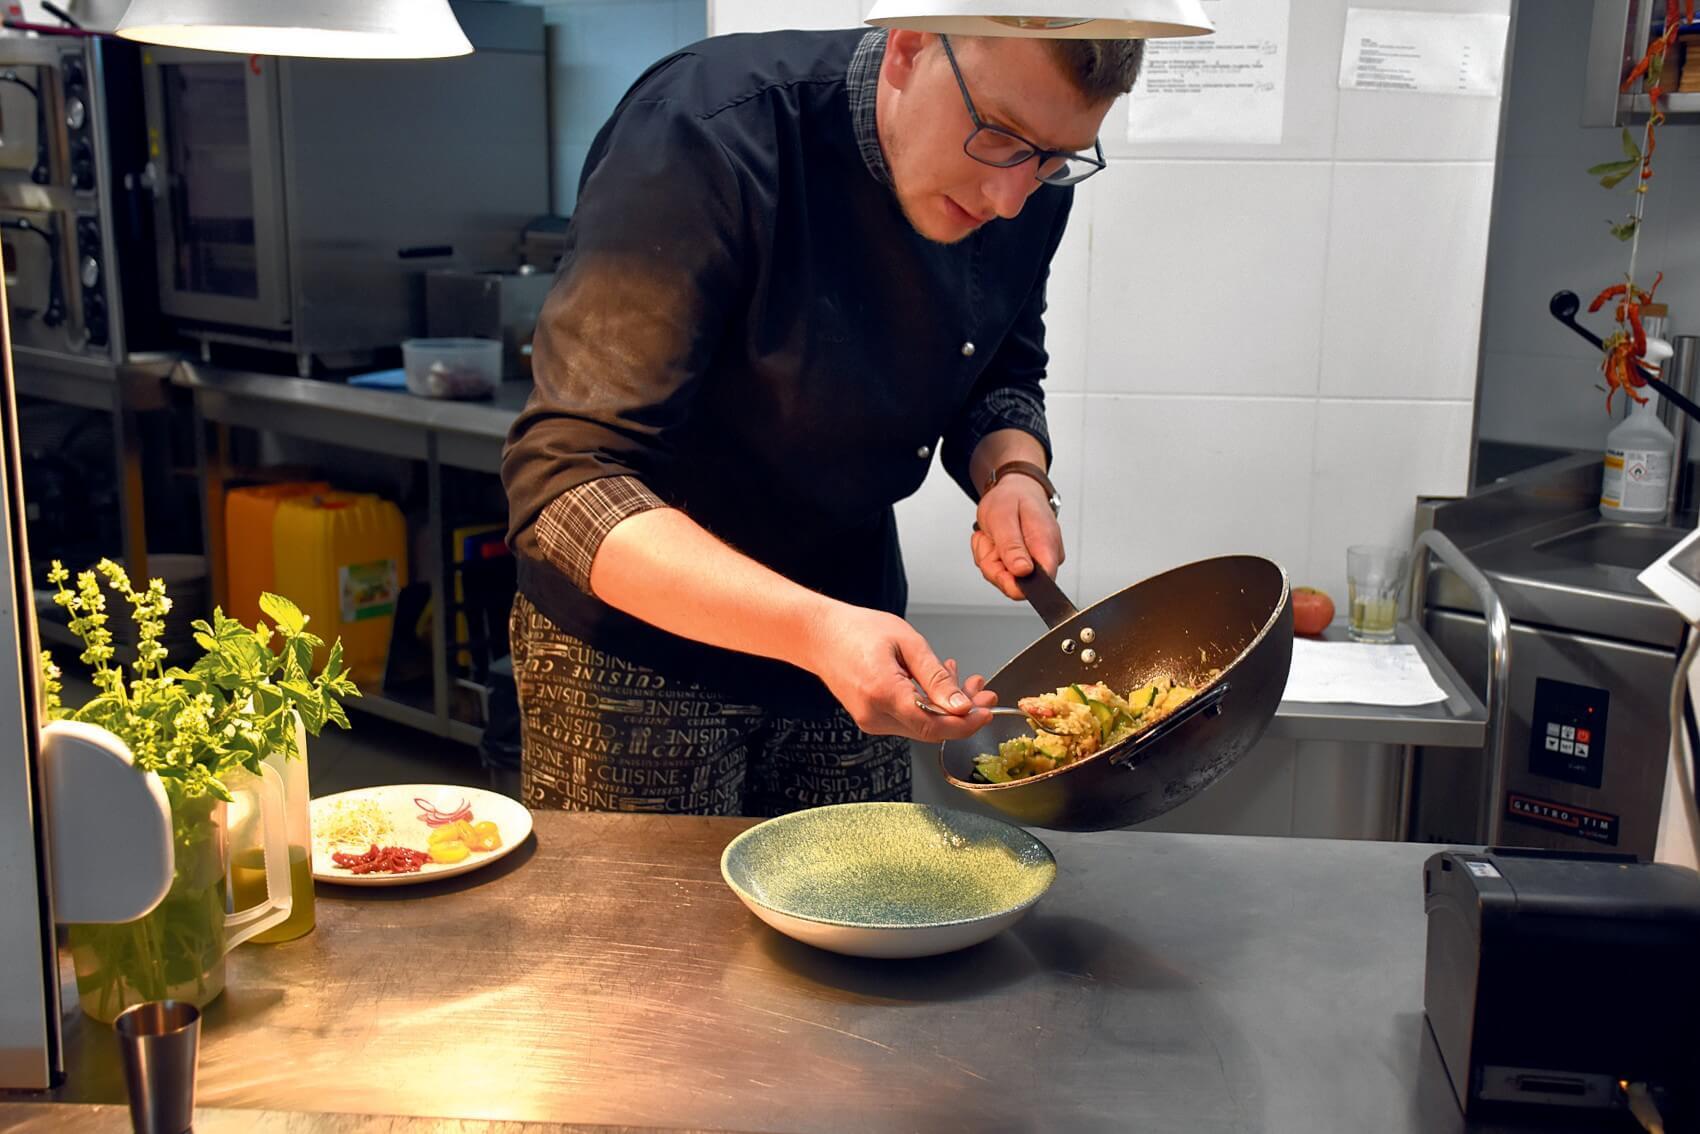 Ivan Chef of G Chelo Restaurant on Kalamota